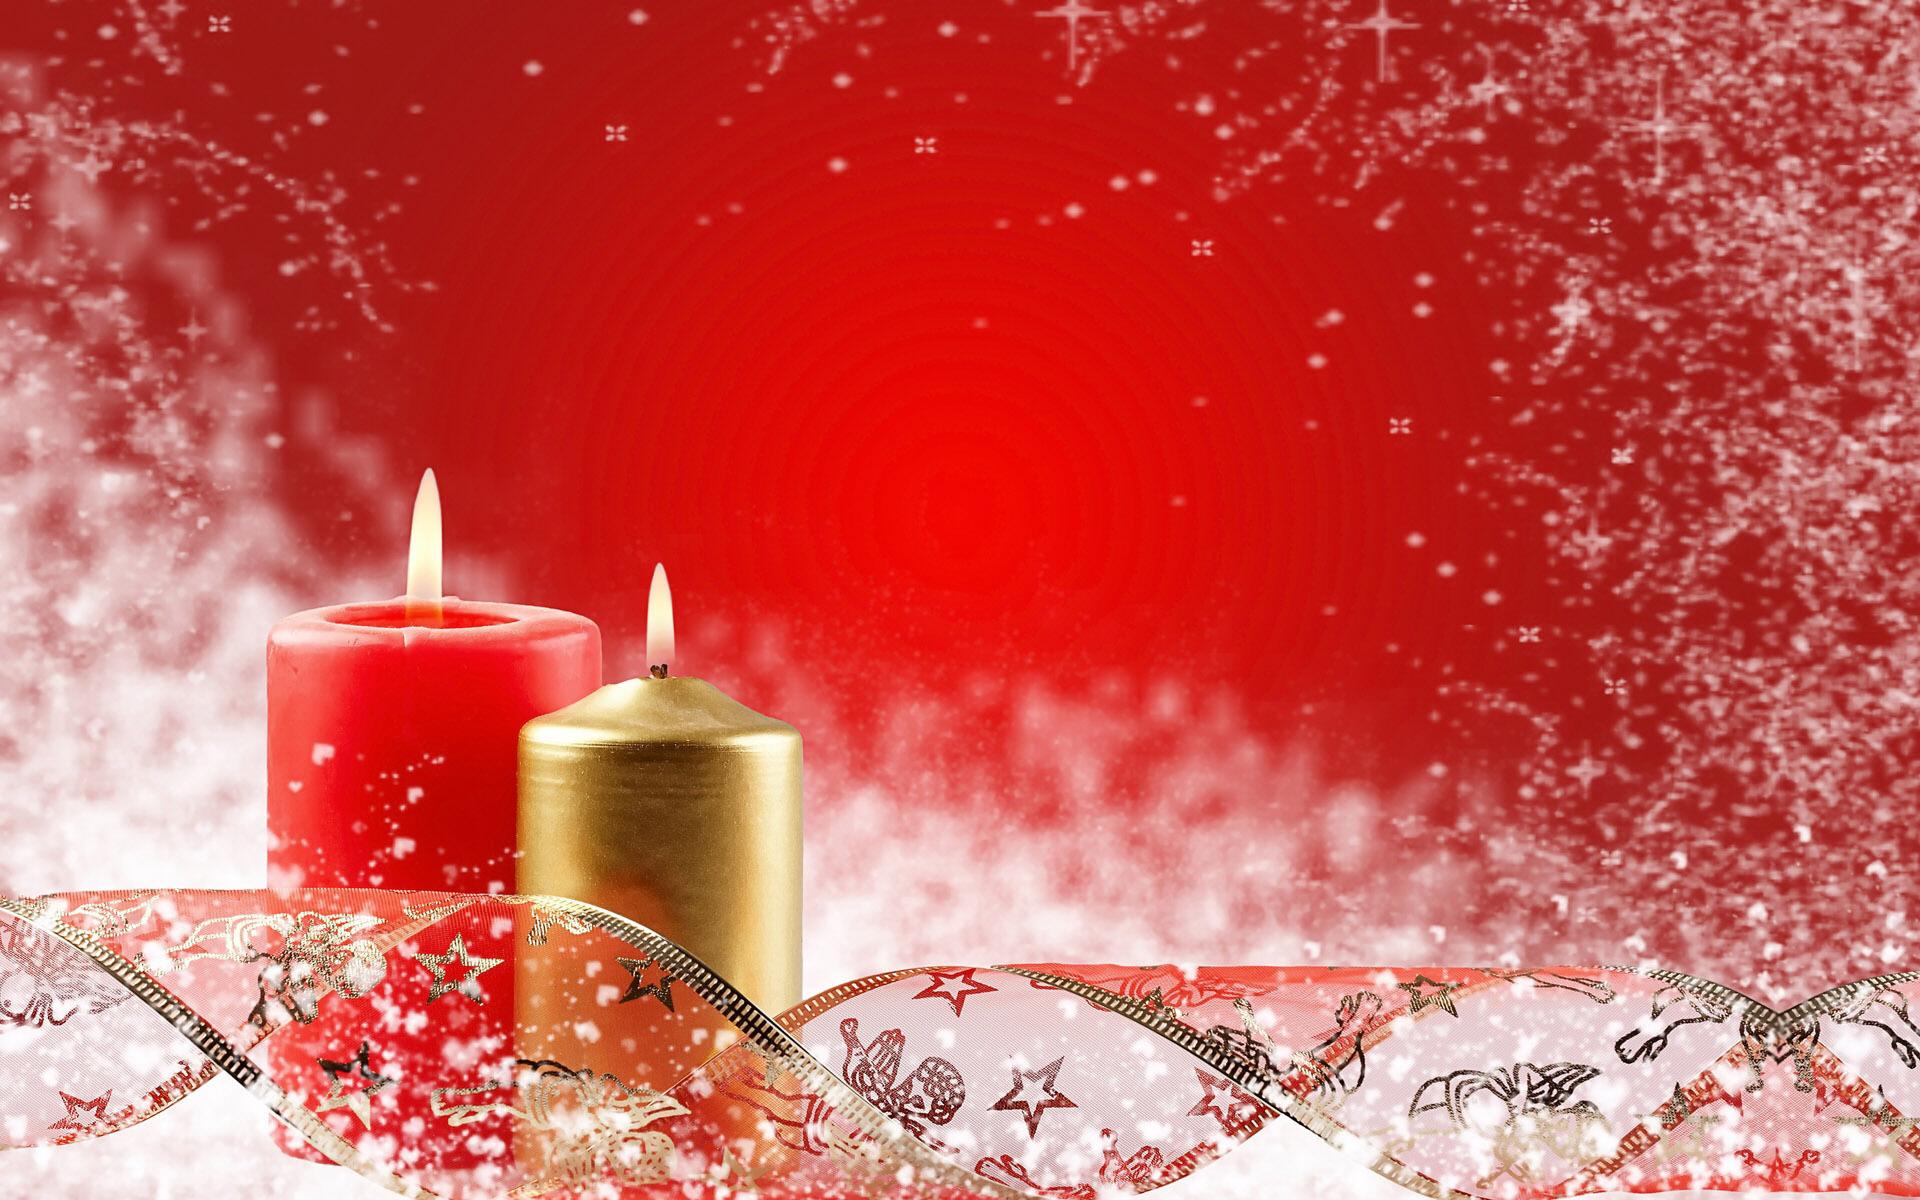 Merry Christmas Desktop Wallpapers FREE on Latoro.com